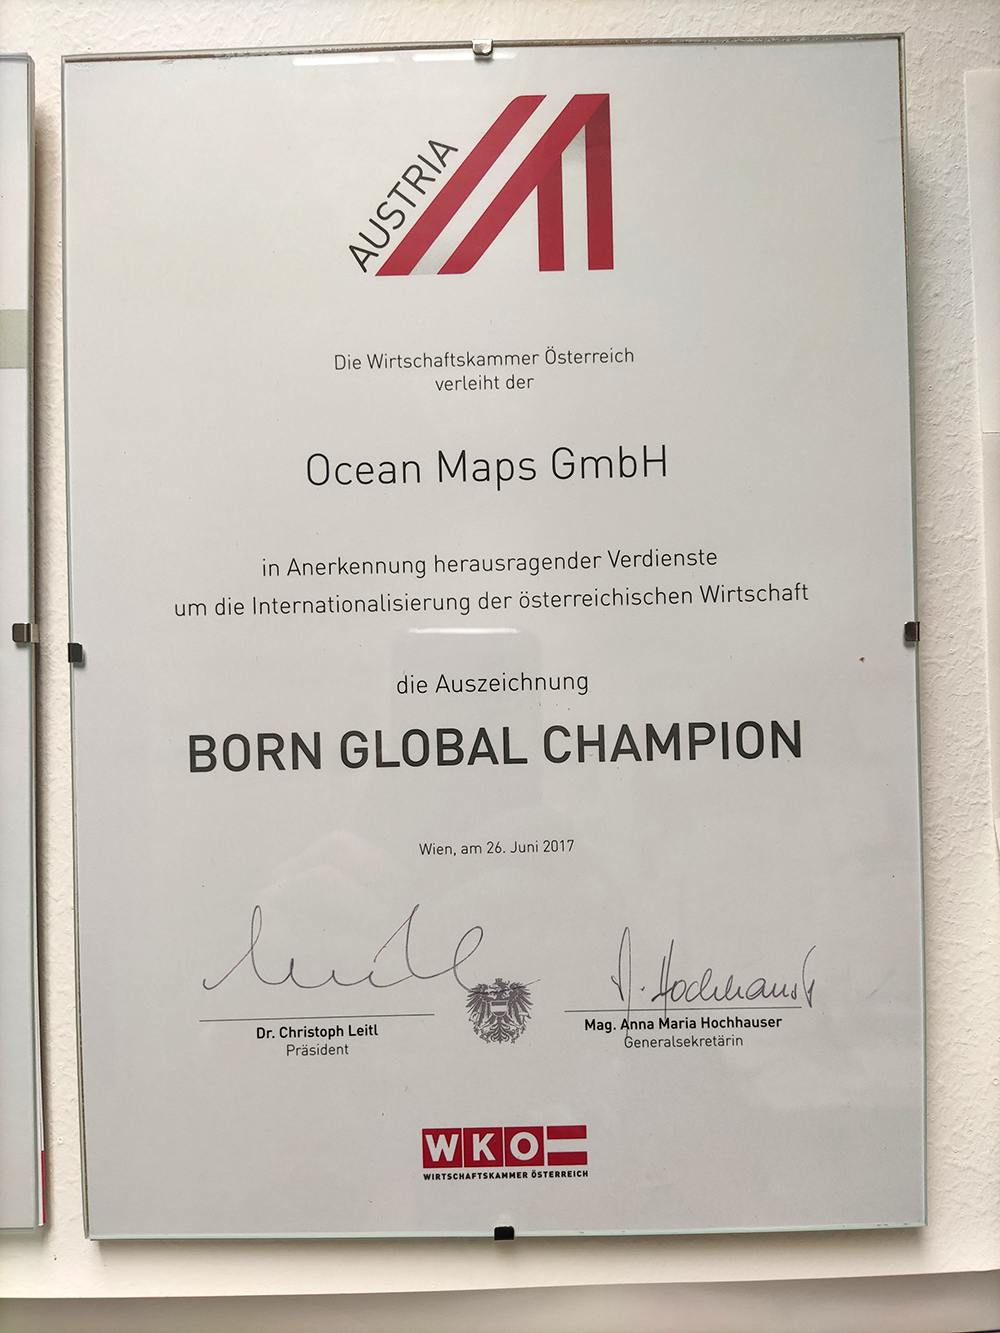 WKO Ocean-Maps-GmbH Urkunde BORN-GLOBAL-CHAMPION 2017